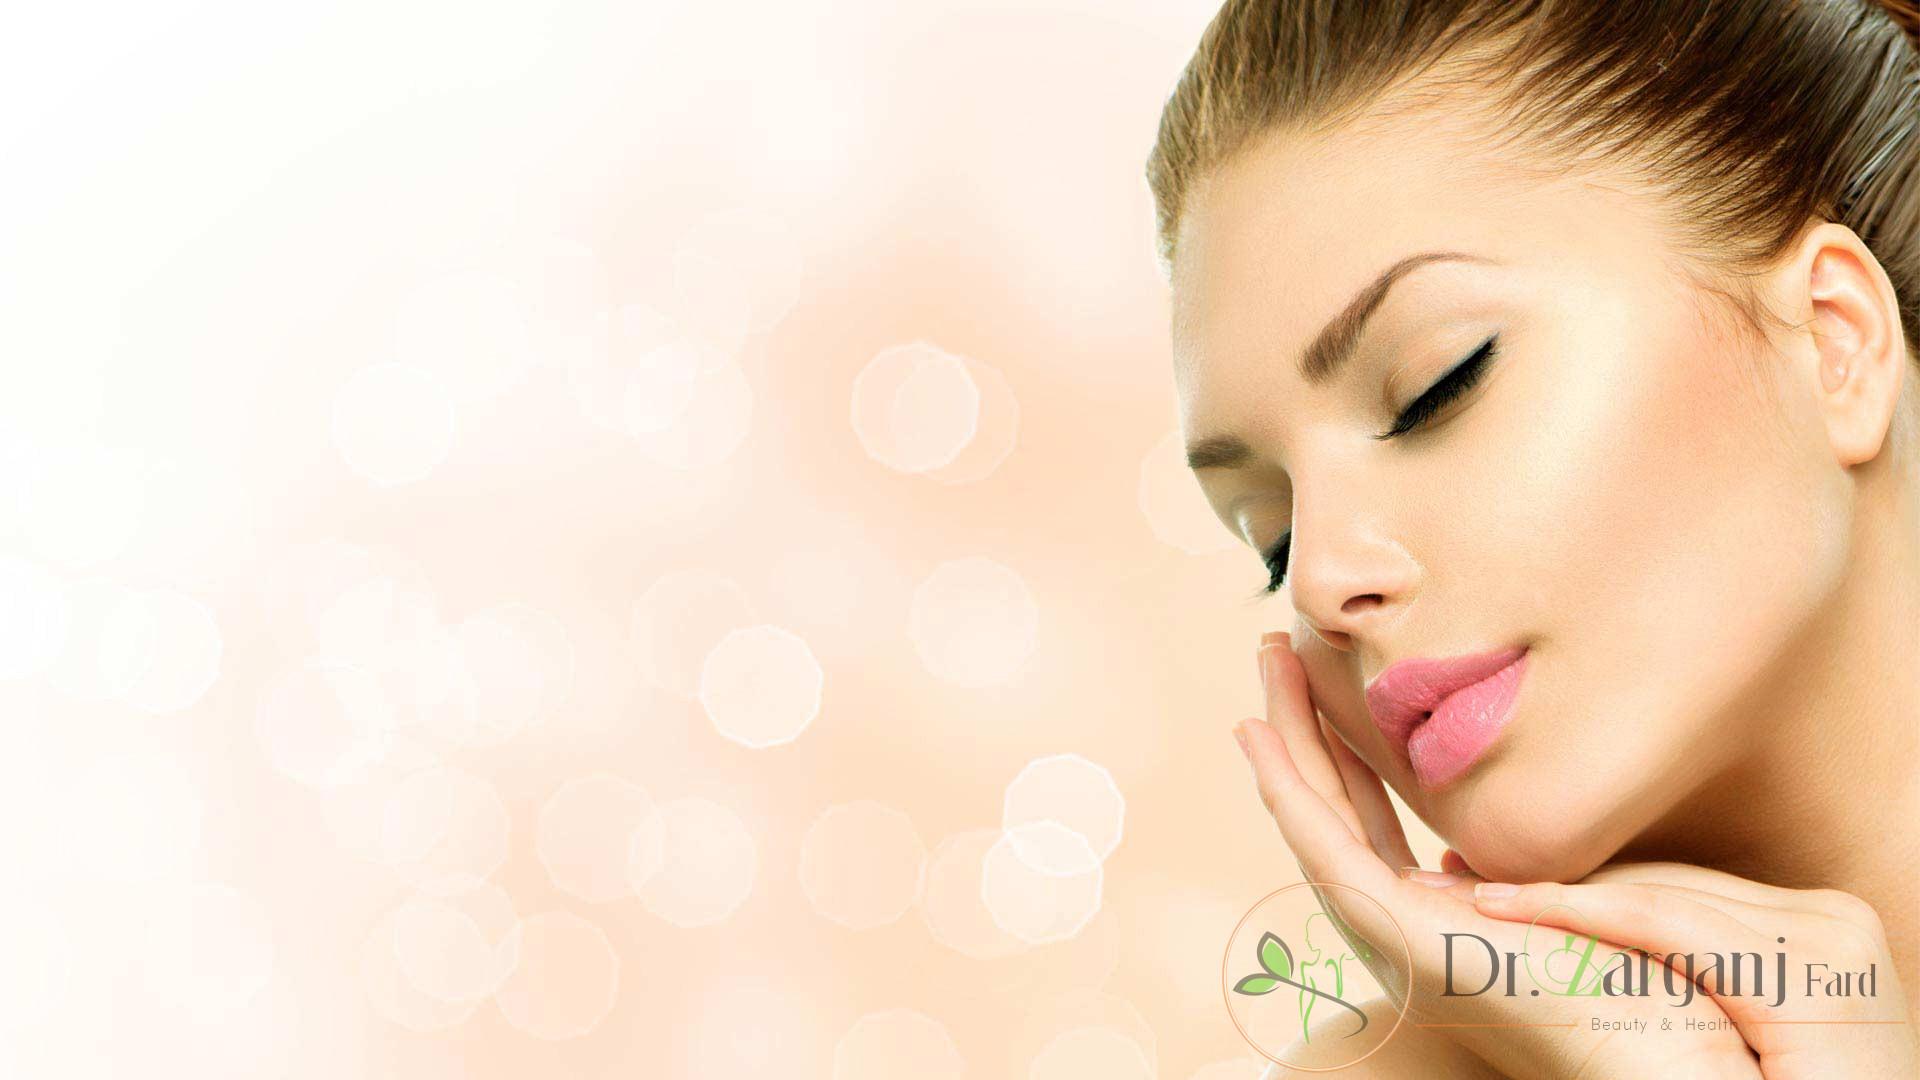 معرفی متخصص پوست و مو